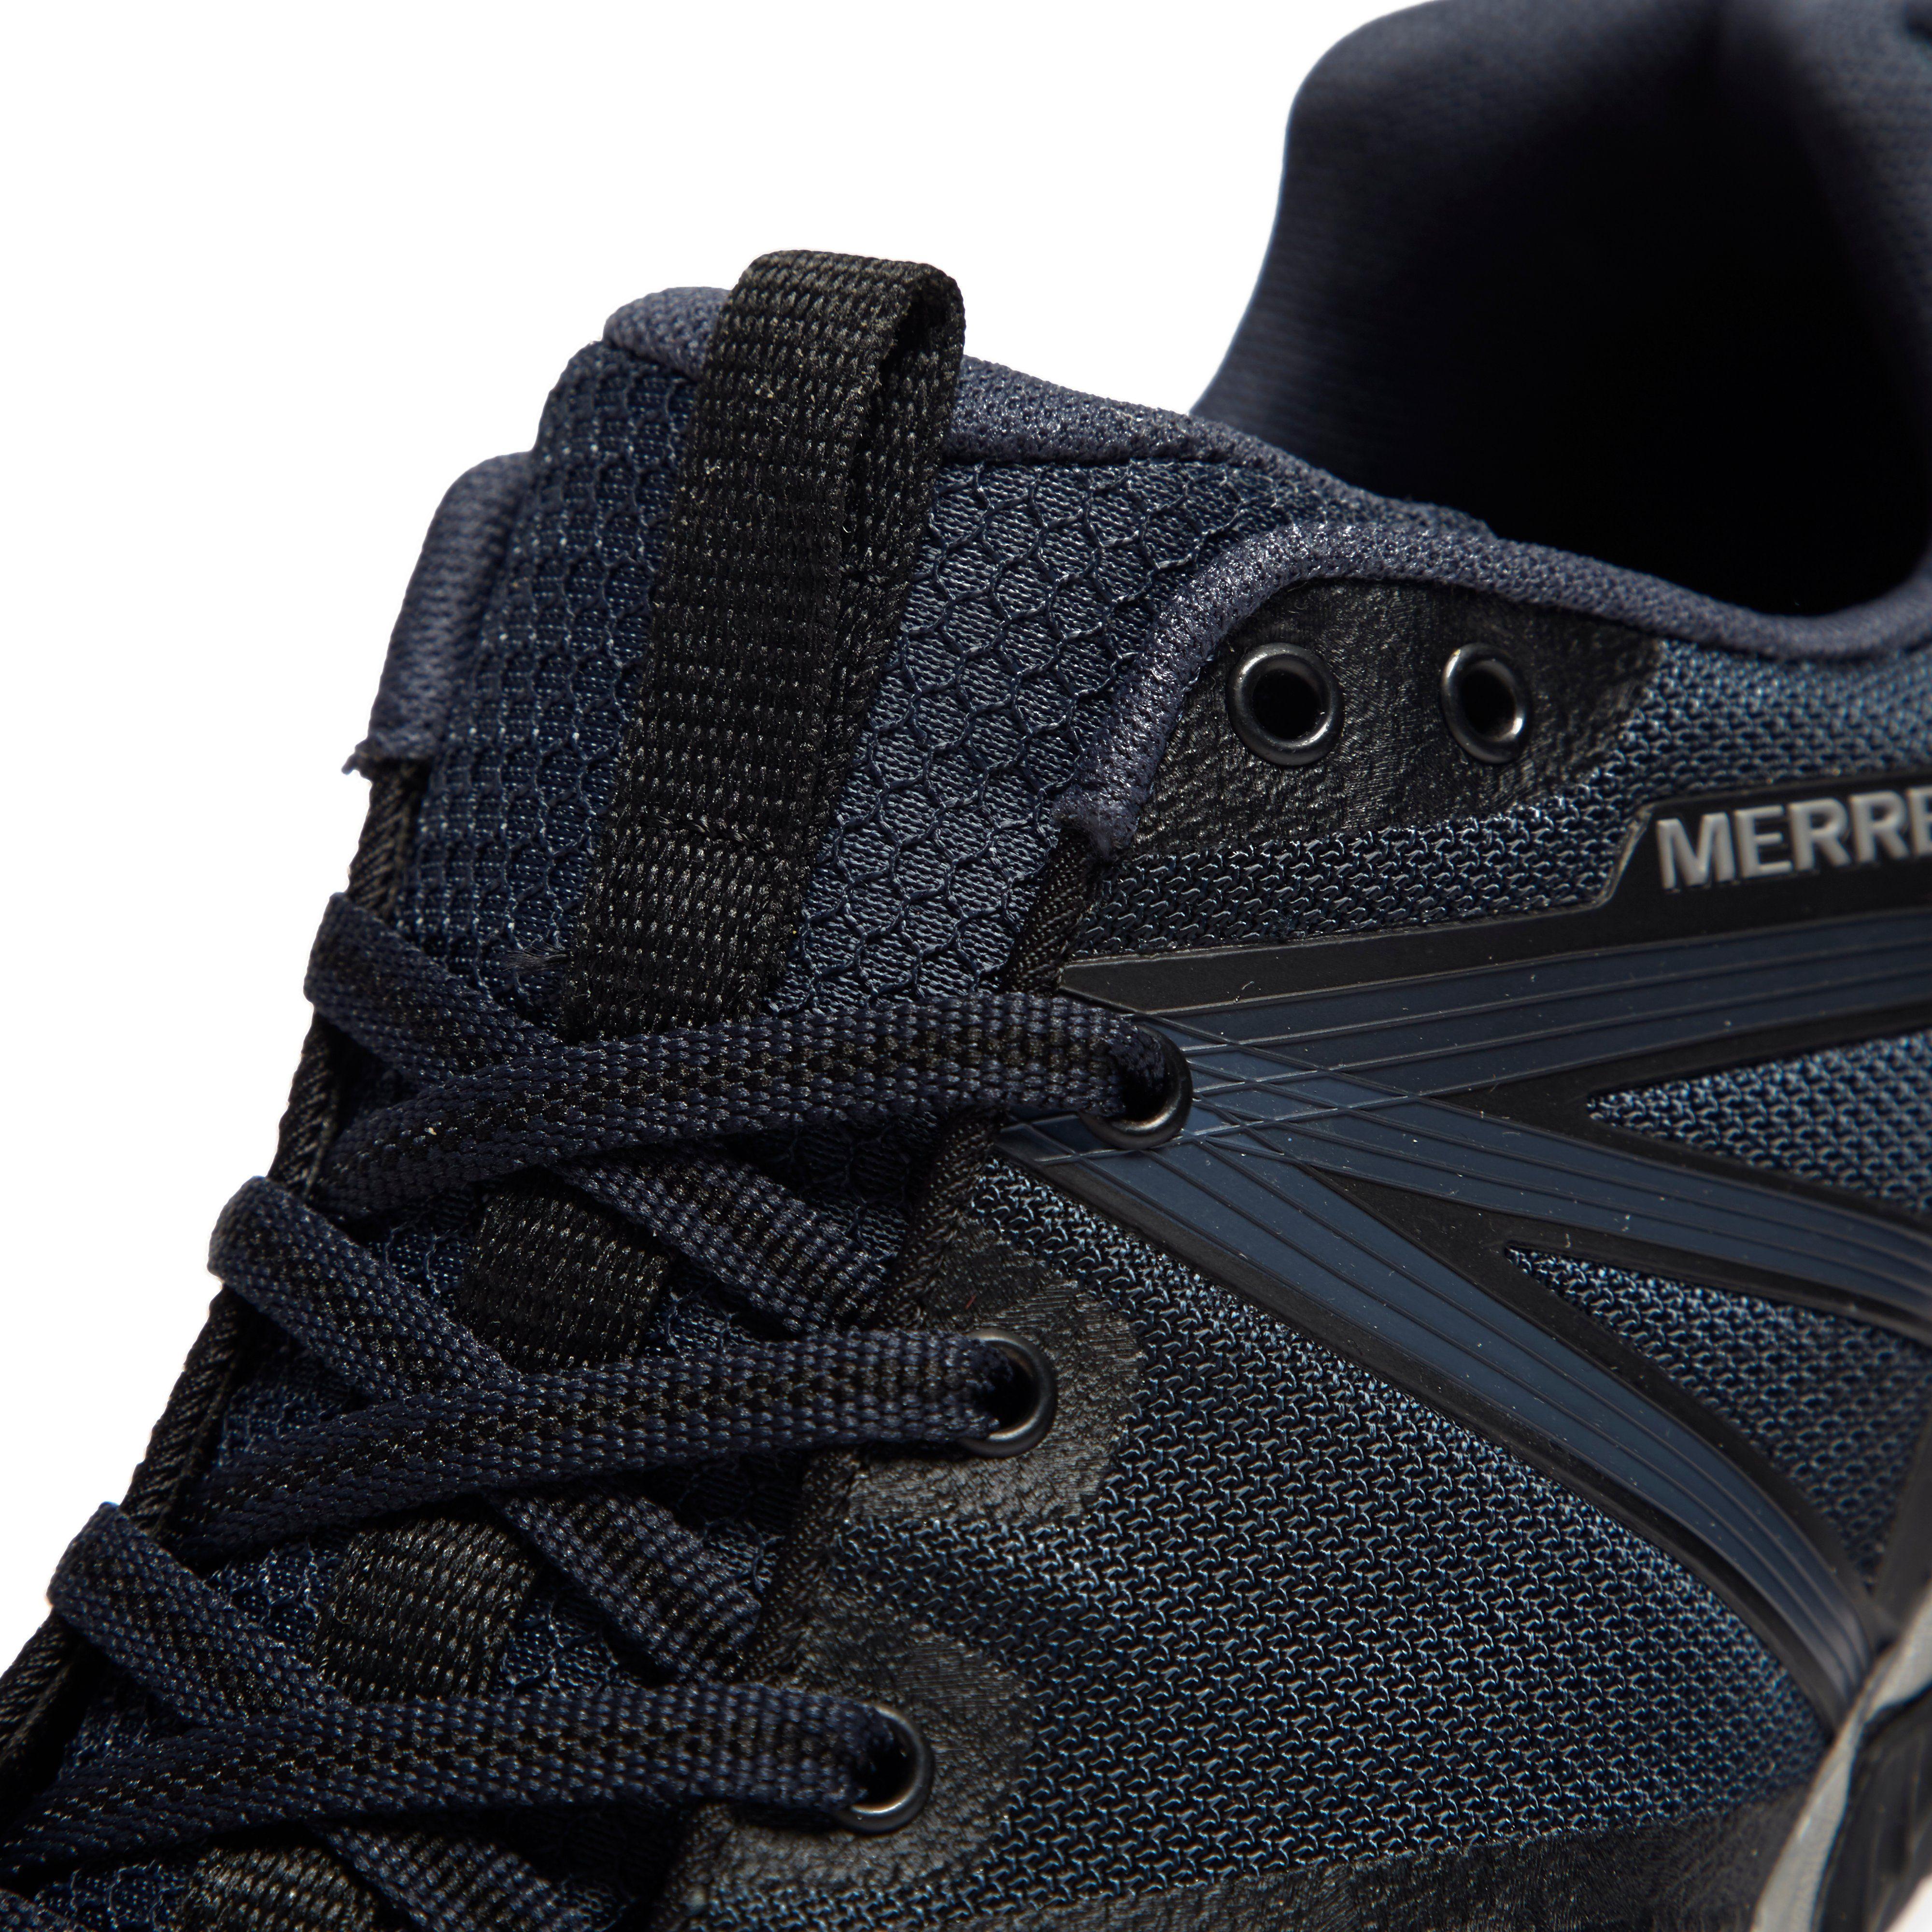 Merrell MQM Flex Luna Men's Trail Running Shoes